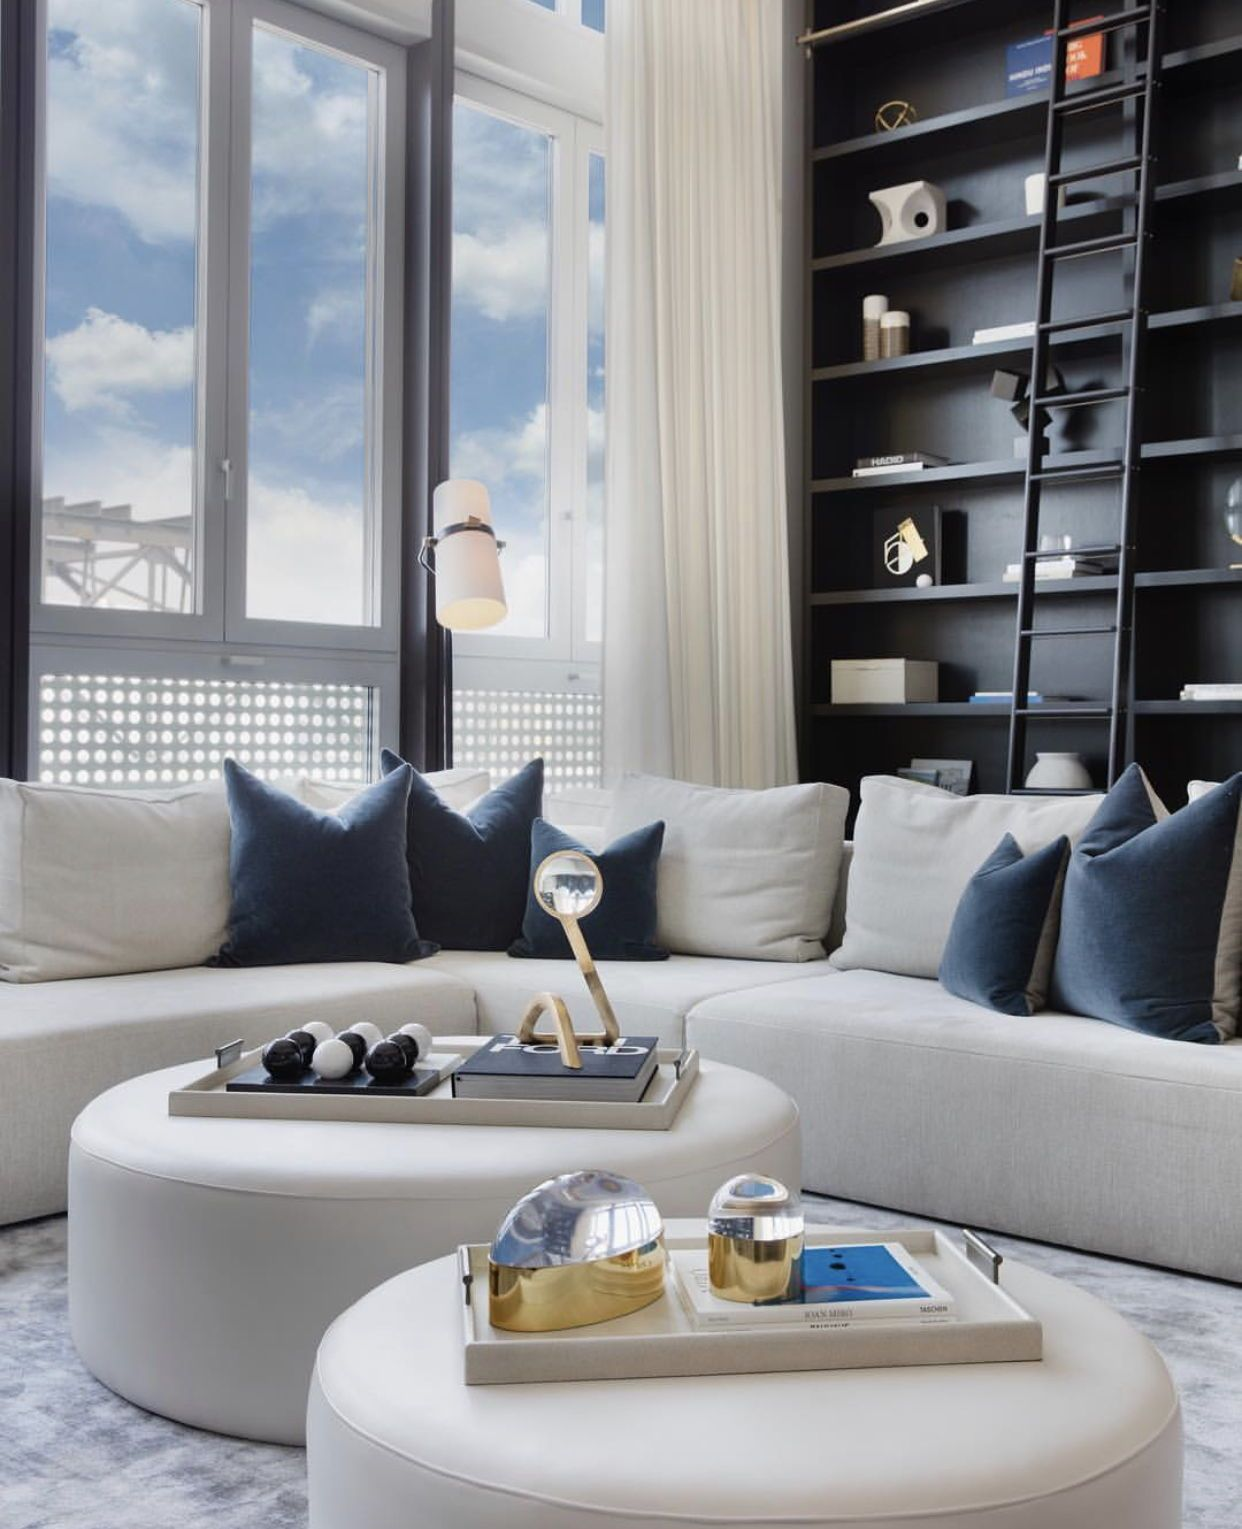 Sharing Our Bright Contrast Interior Interior Design New York Interior Design Usa Best Interior Design